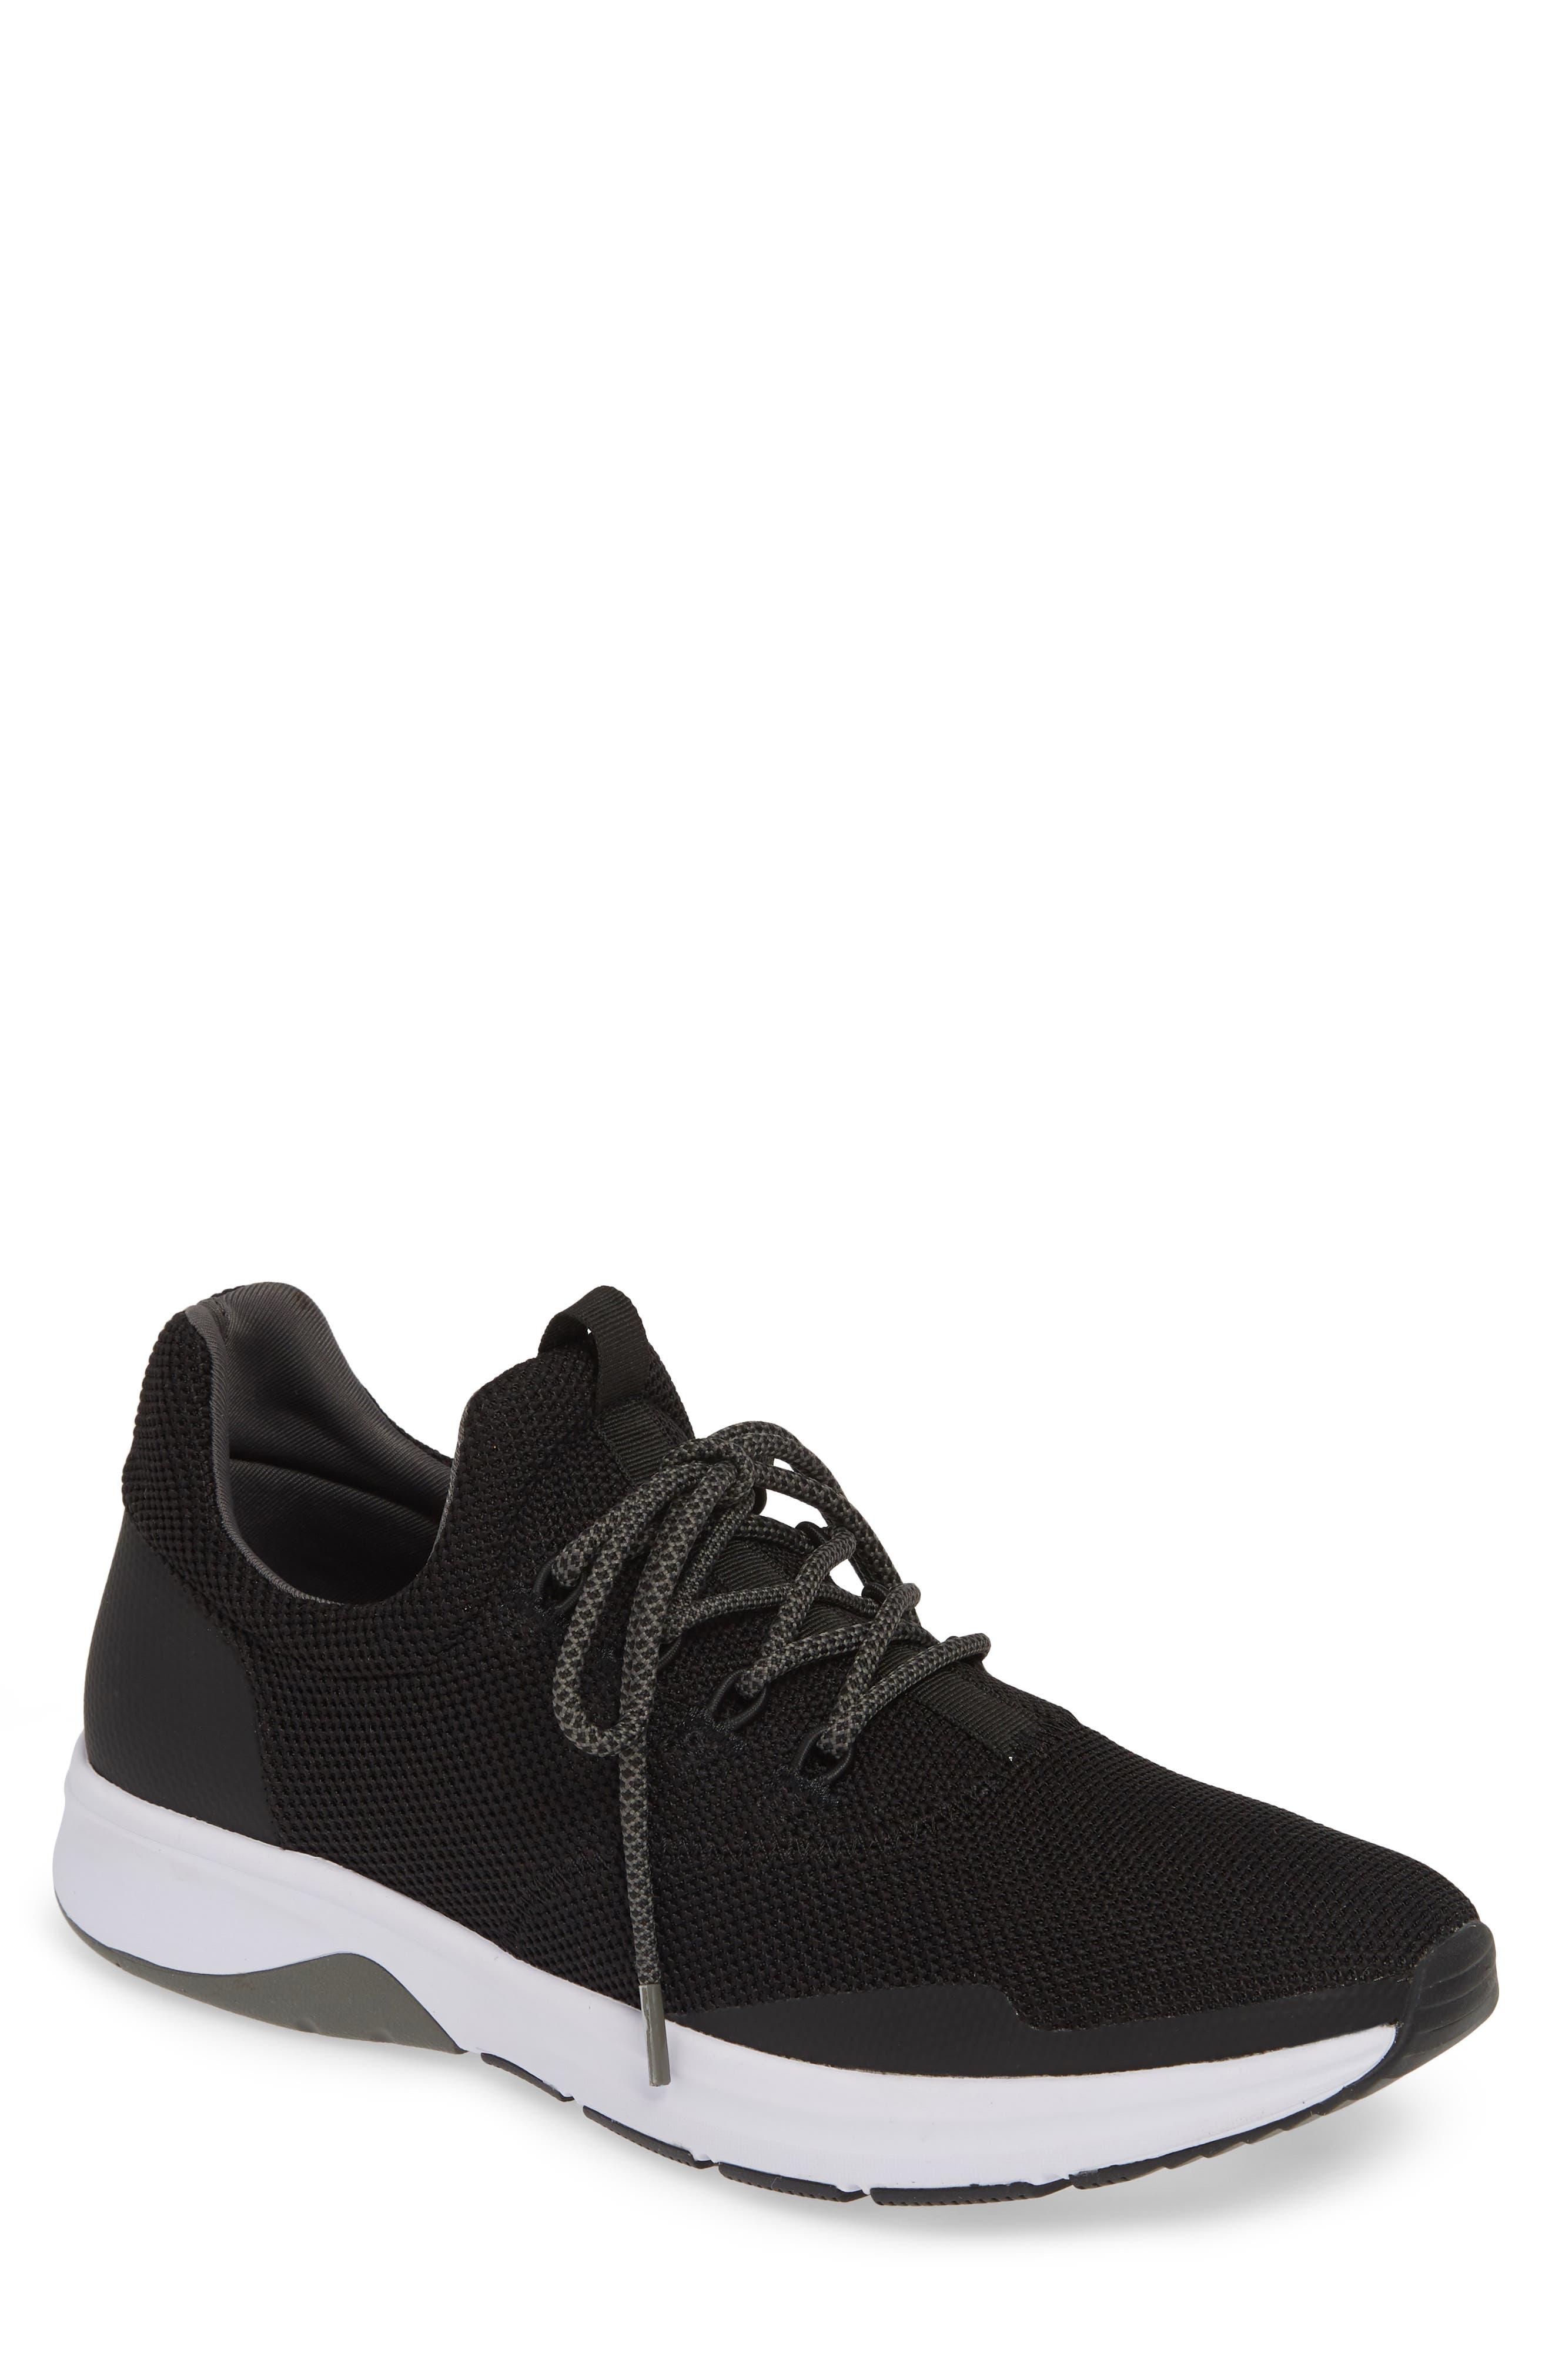 THE RAIL, Axel Sneaker, Main thumbnail 1, color, BLACK